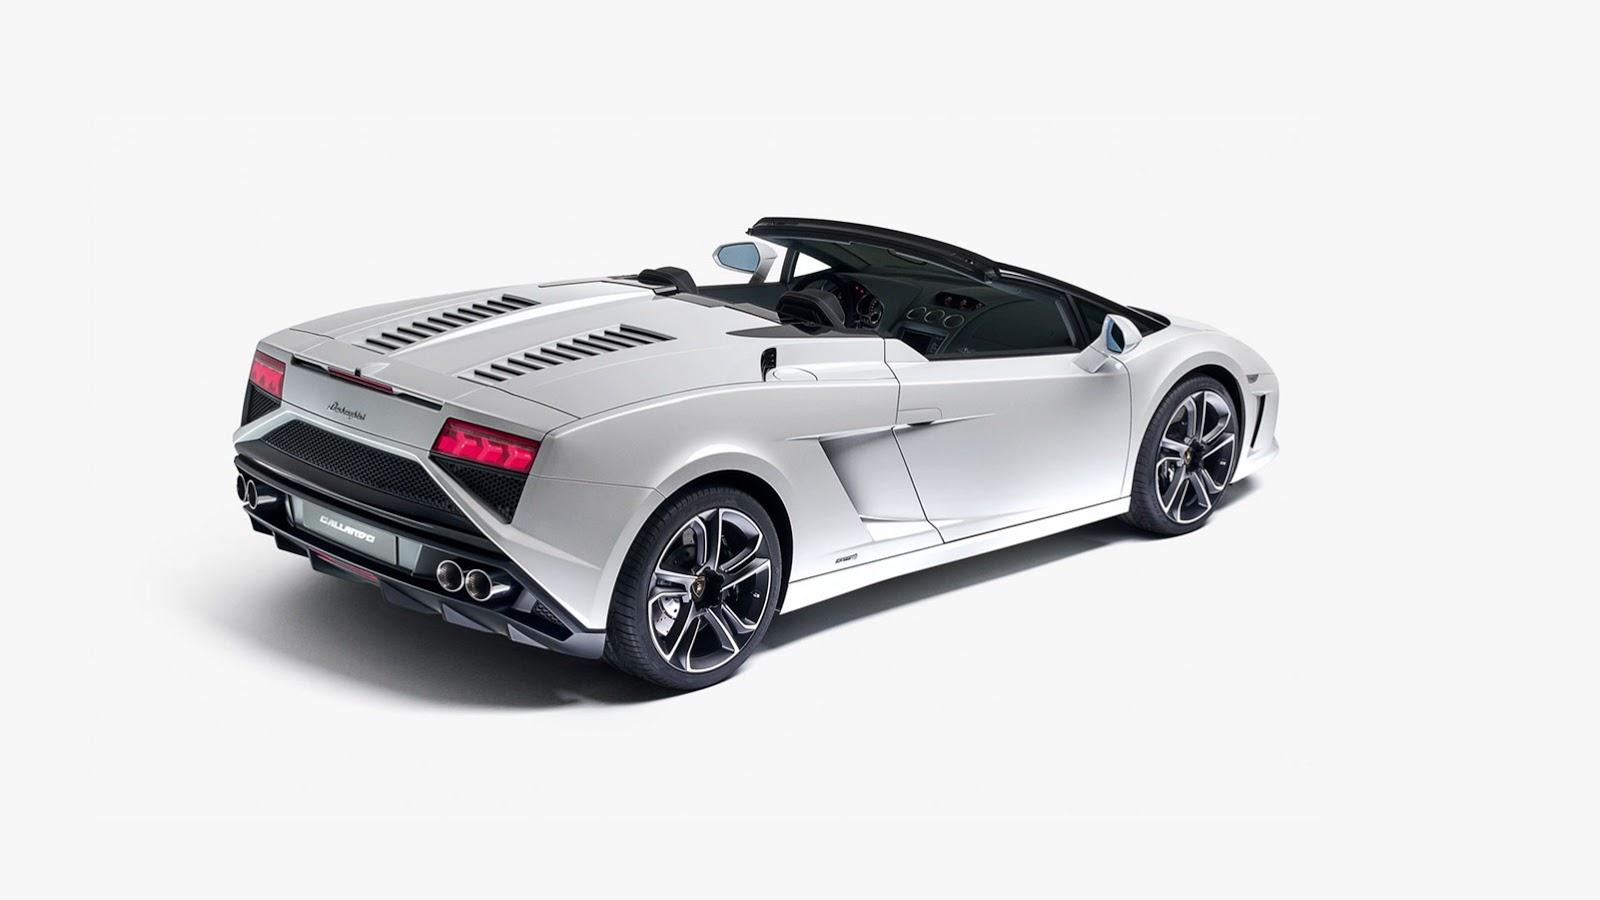 Lamborghini_Gallardo_Spyder_Facelift